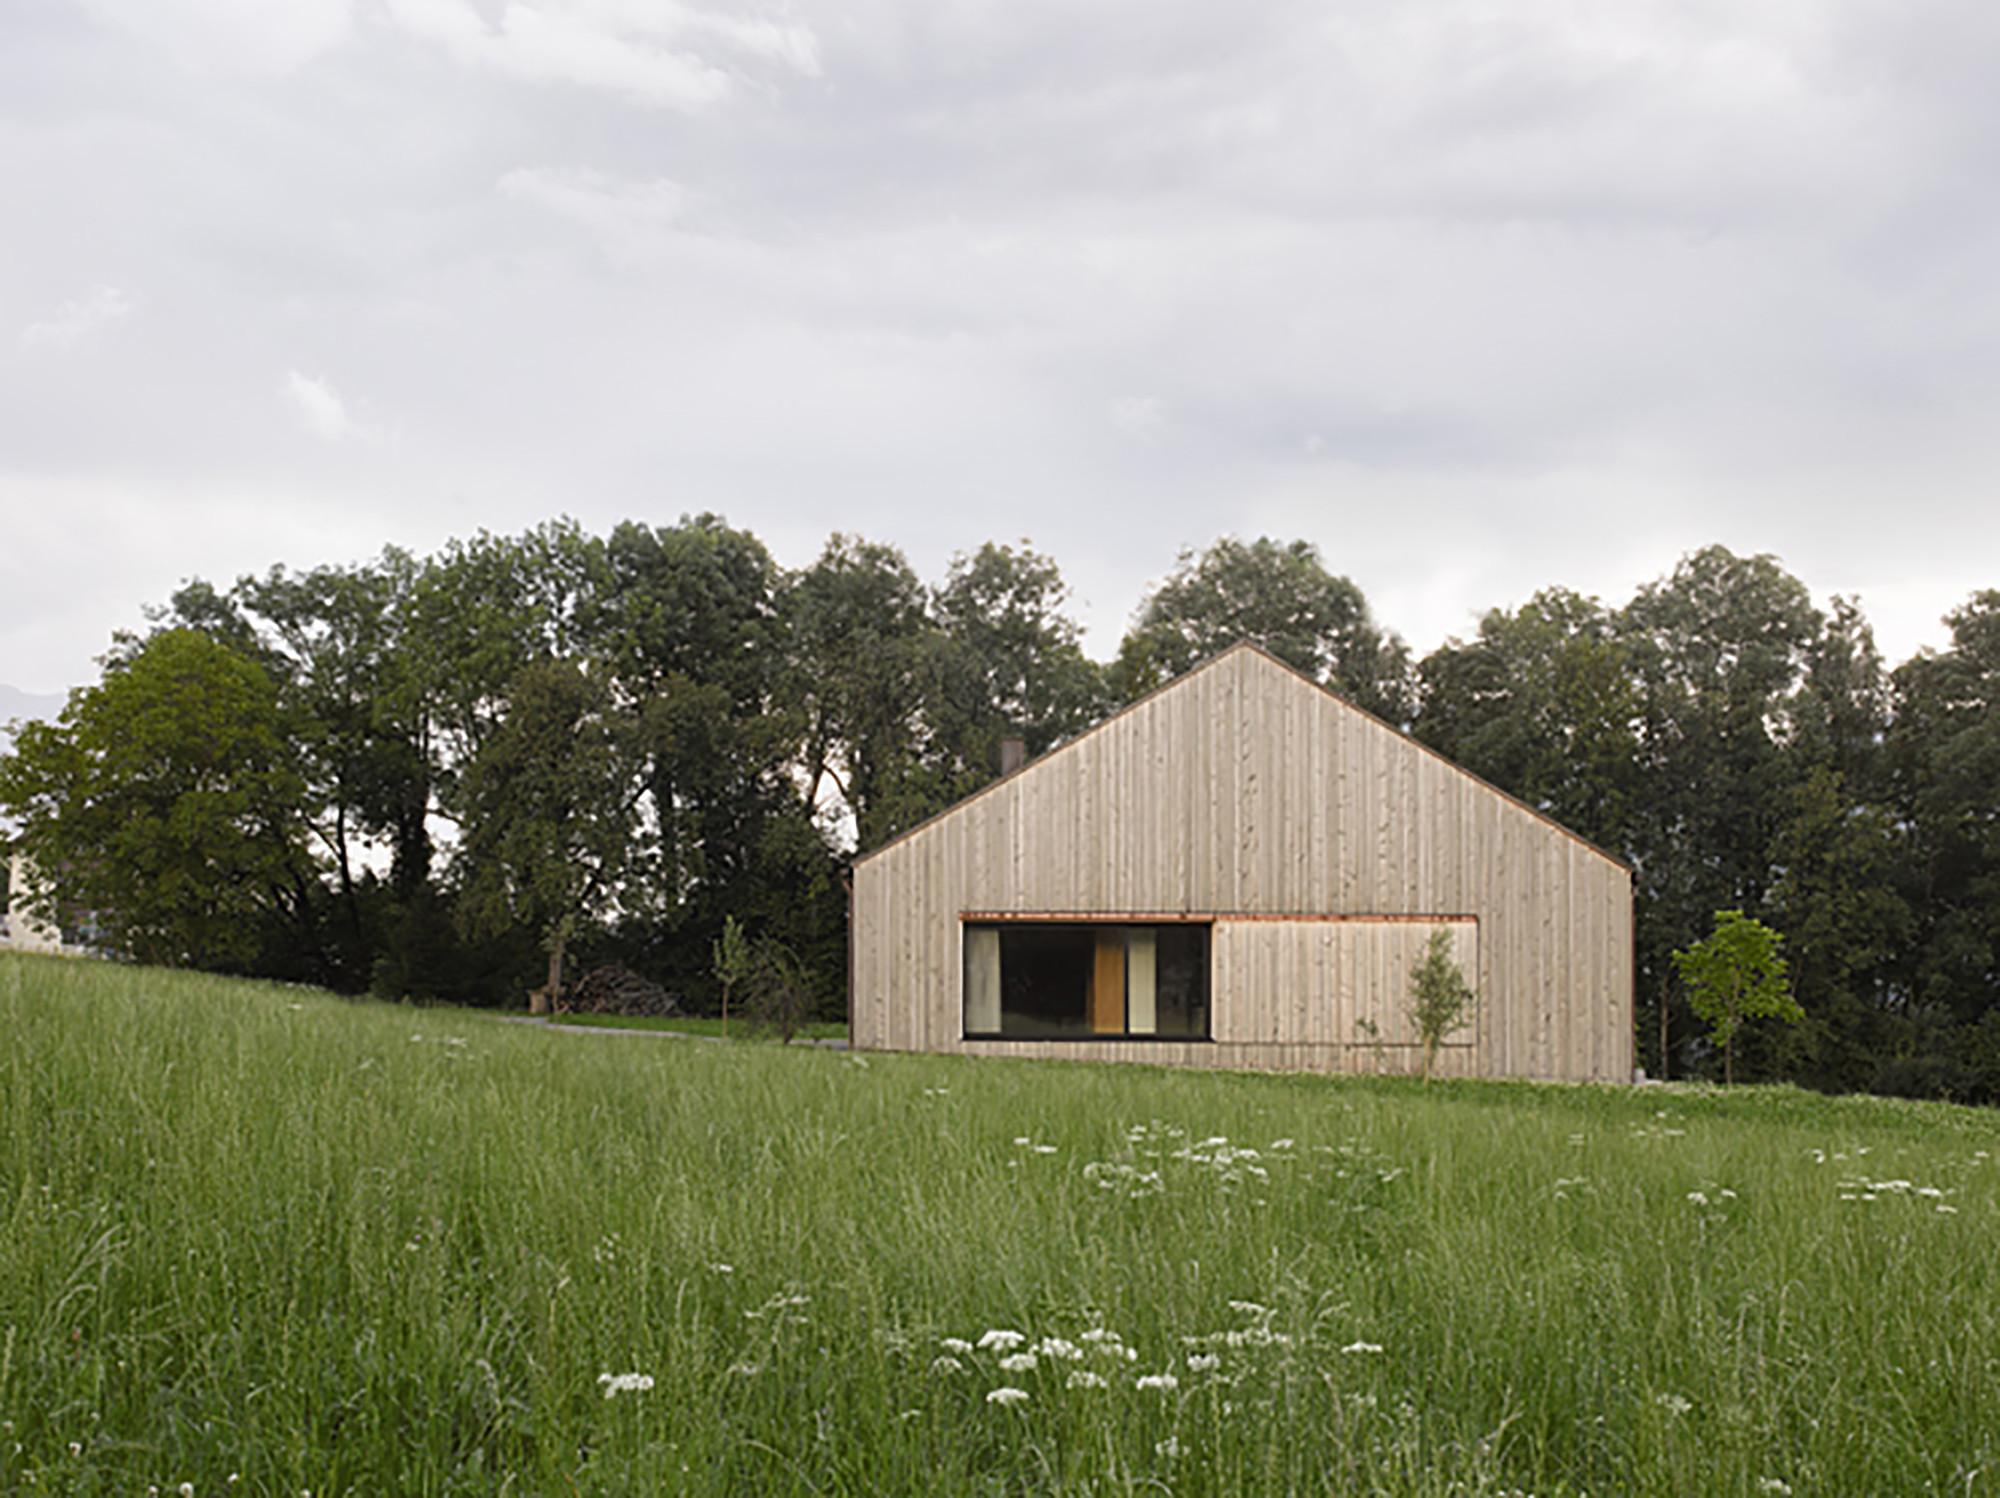 Haus Kaltschmieden / Bernardo Bader Architects, © Adolf Bereuter